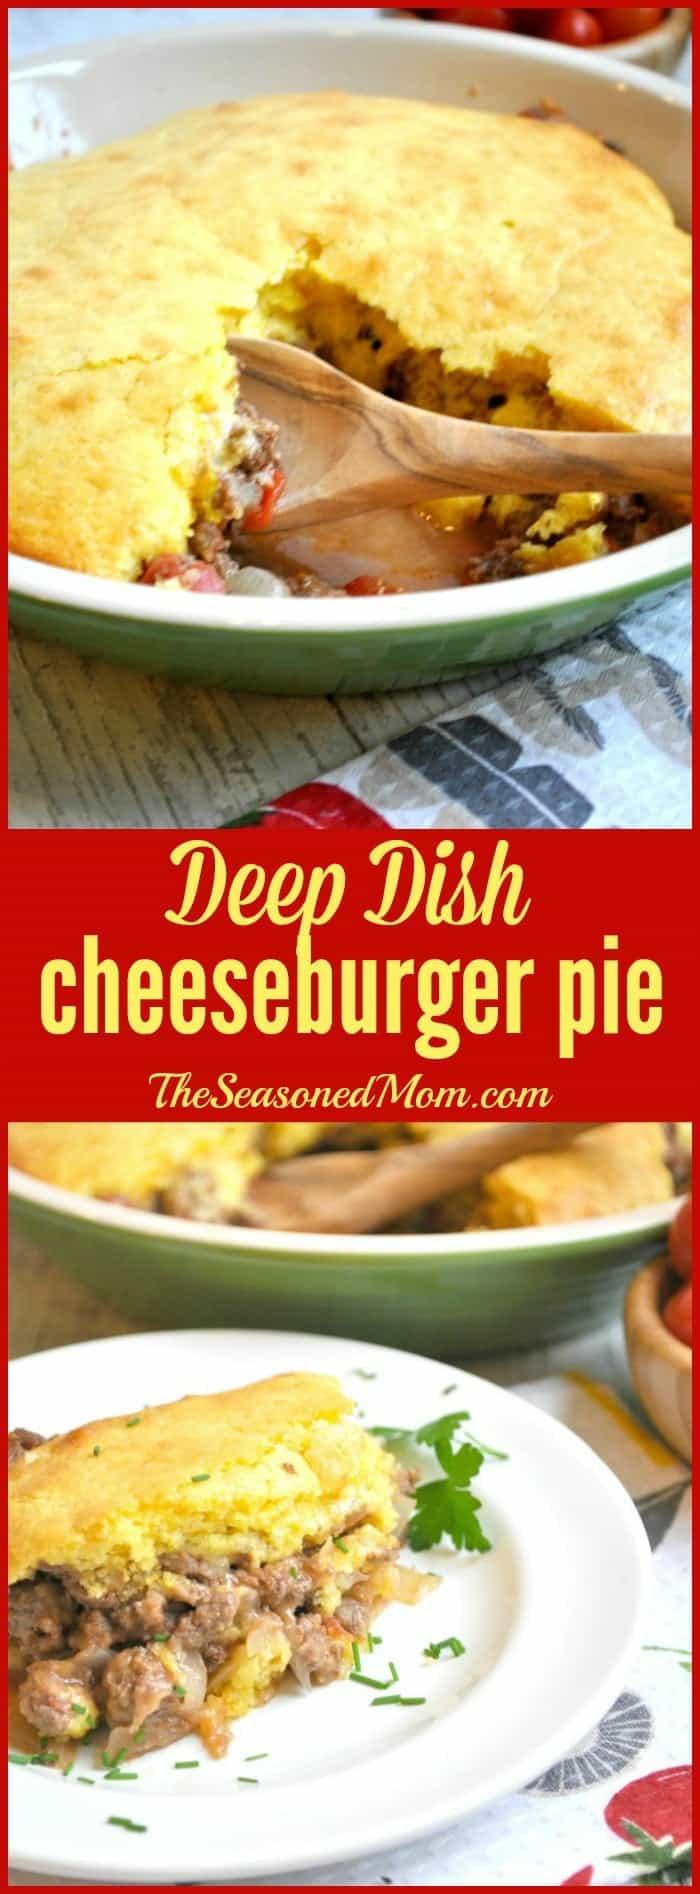 Deep Dish Cheeseburger Pie 1